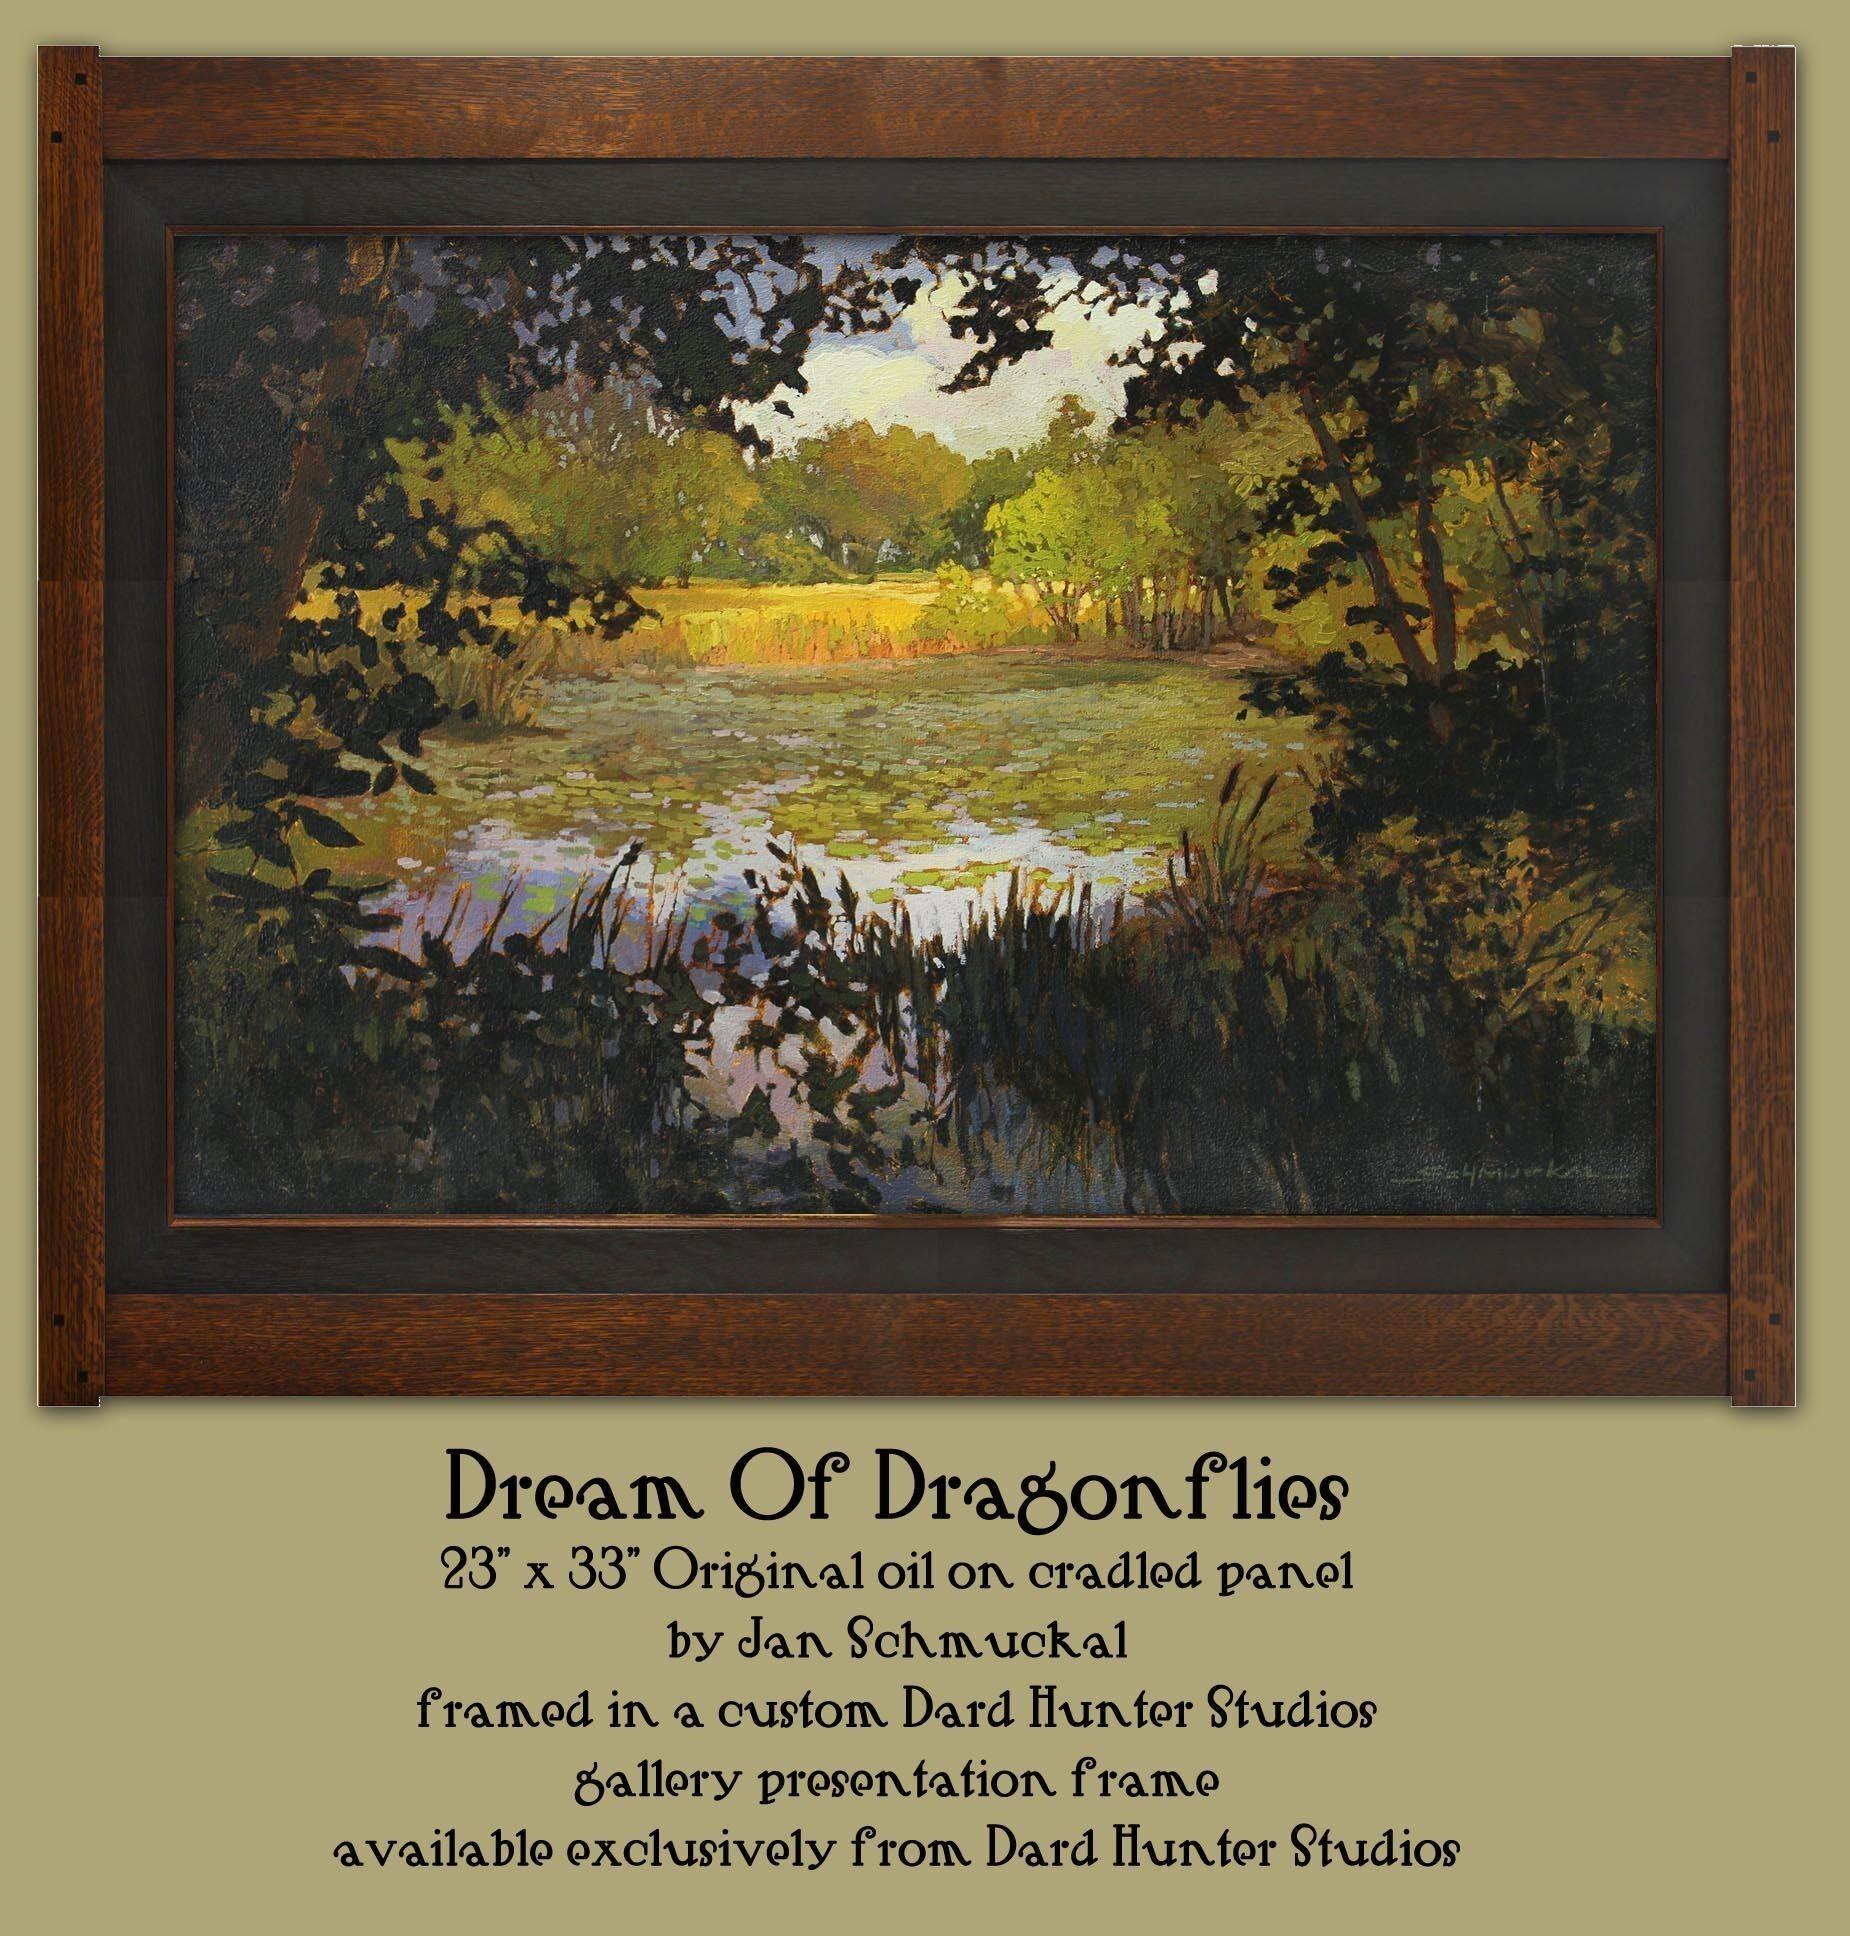 Dream of Dragonflies by Jan Schmuckal  - Product Image